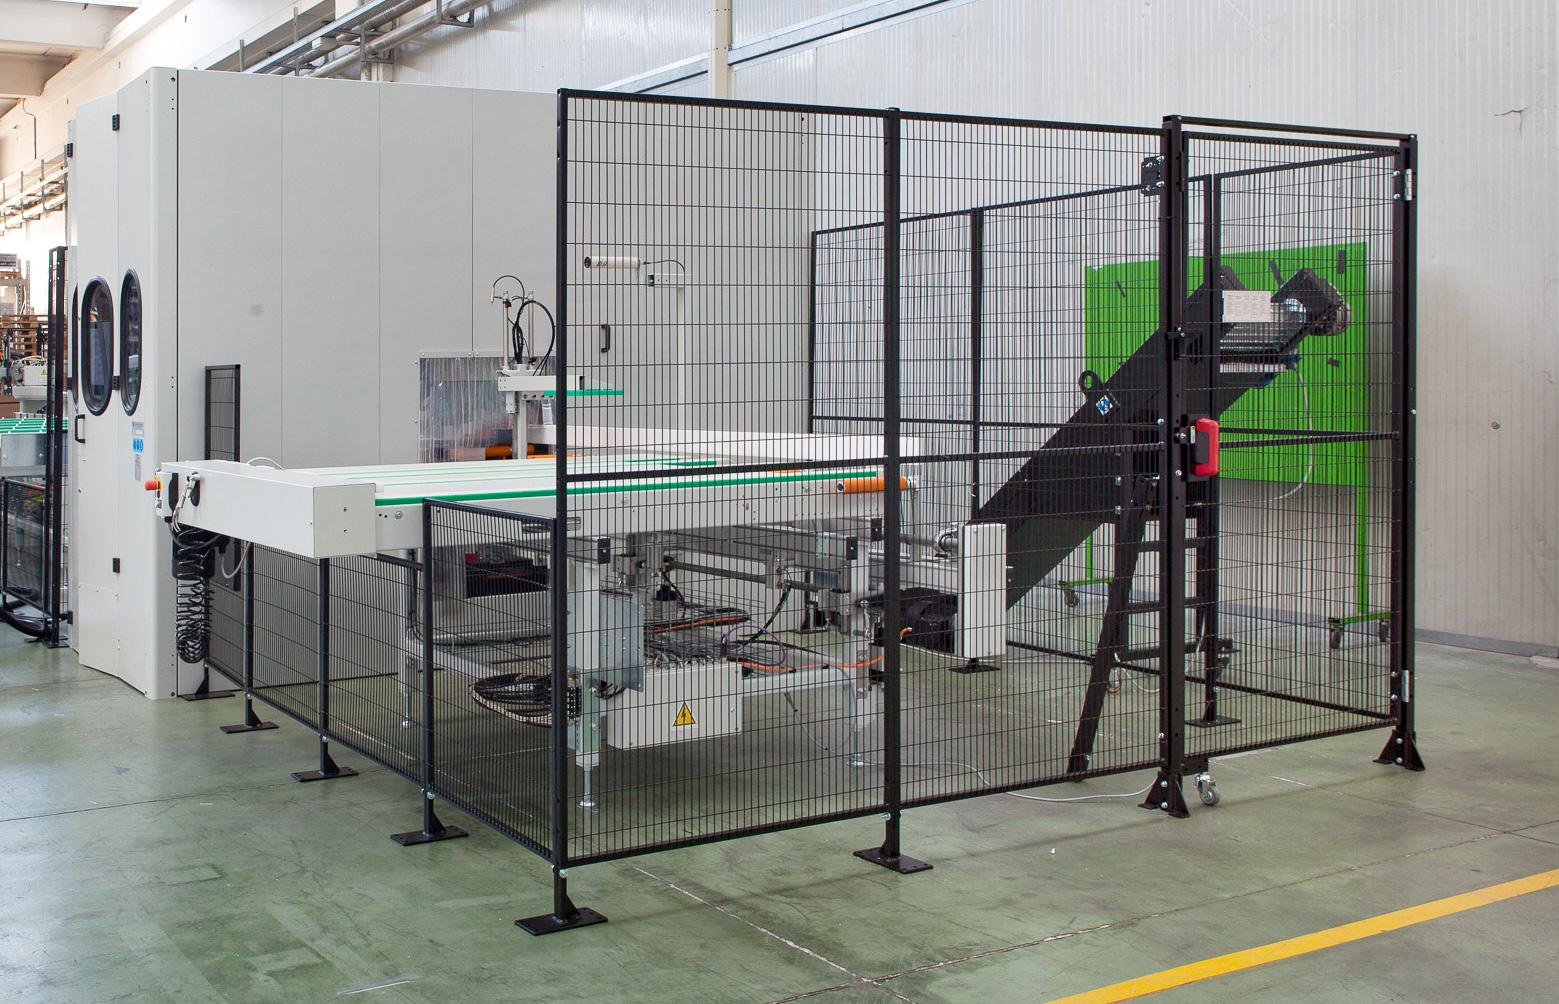 Satech GreenFast DP Industrial Safety Fence - Machine Manufacturer Bundle Solution